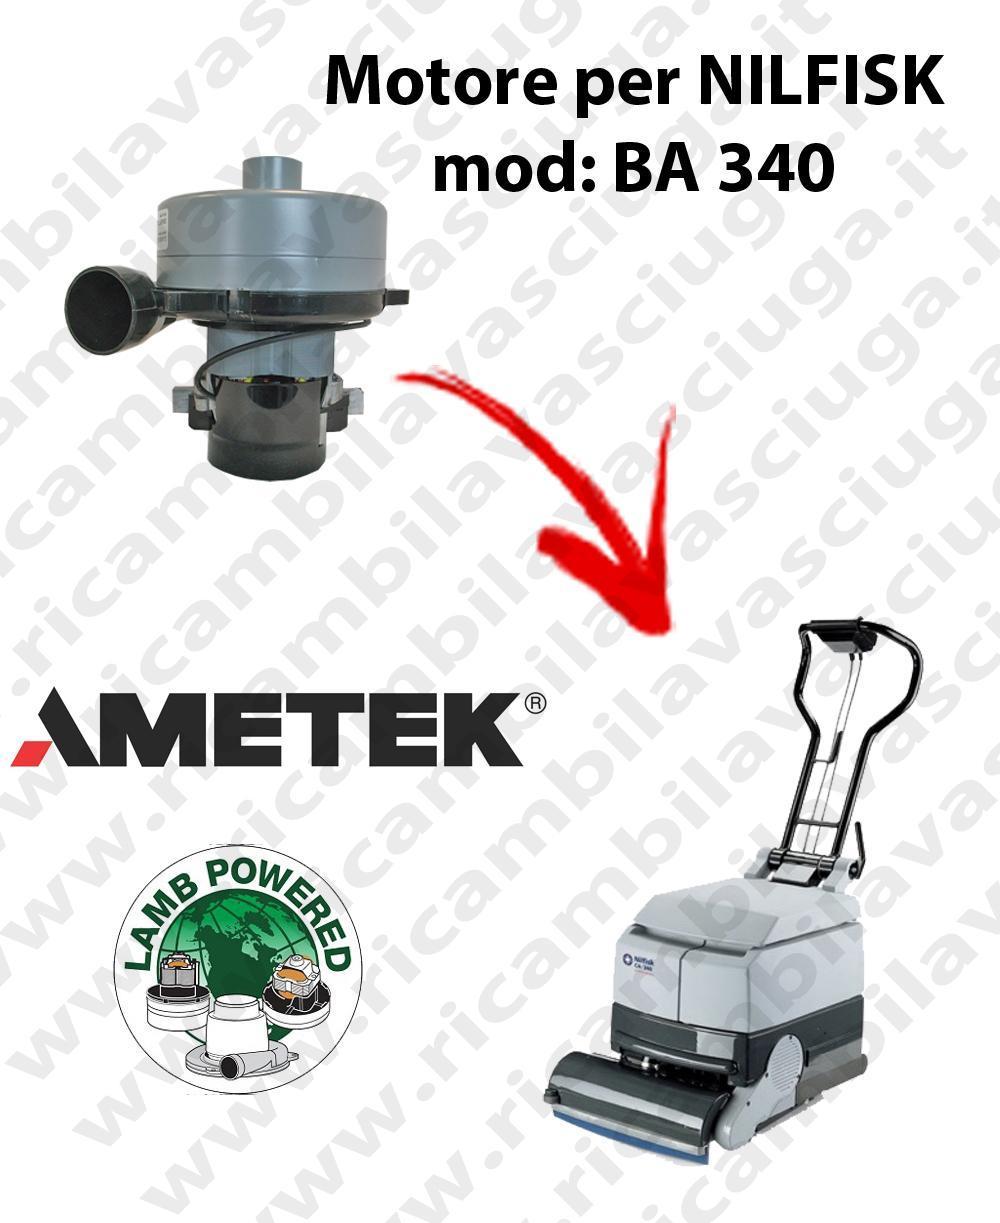 BA 340 Vacuum motor LAMB AMETEK for scrubber dryer NILFISK